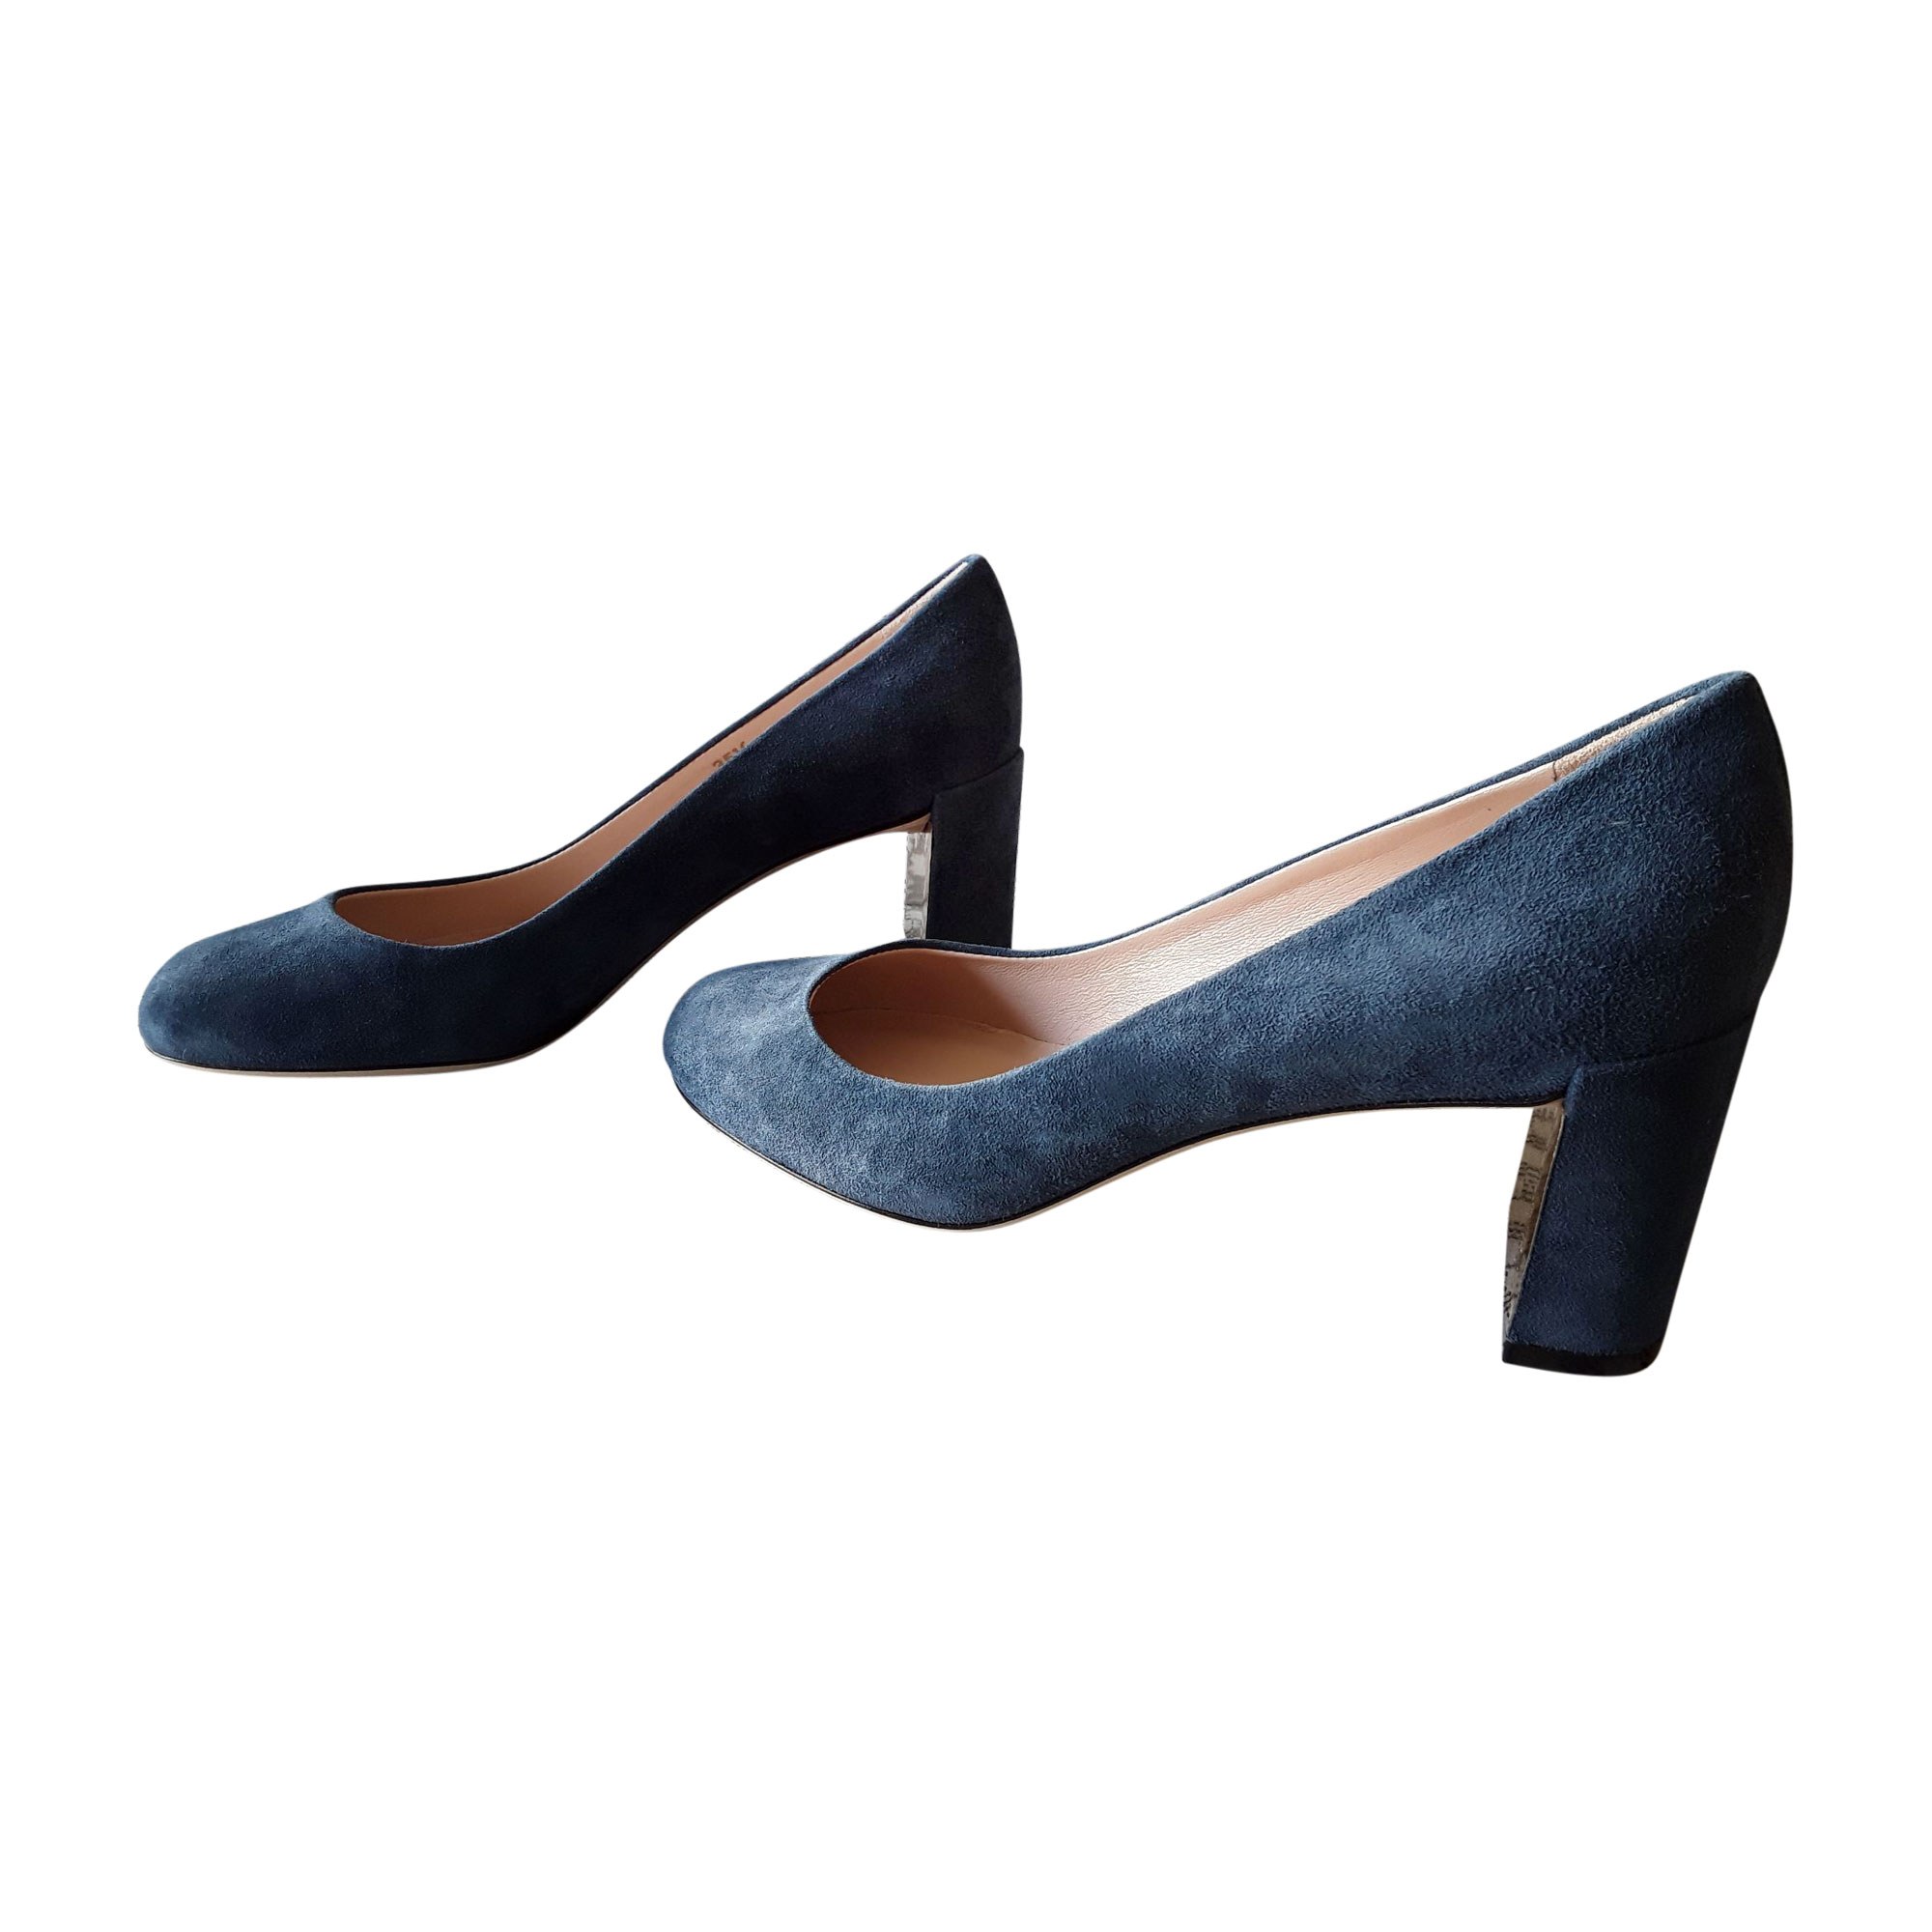 Escarpins FURLA Bleu, bleu marine, bleu turquoise